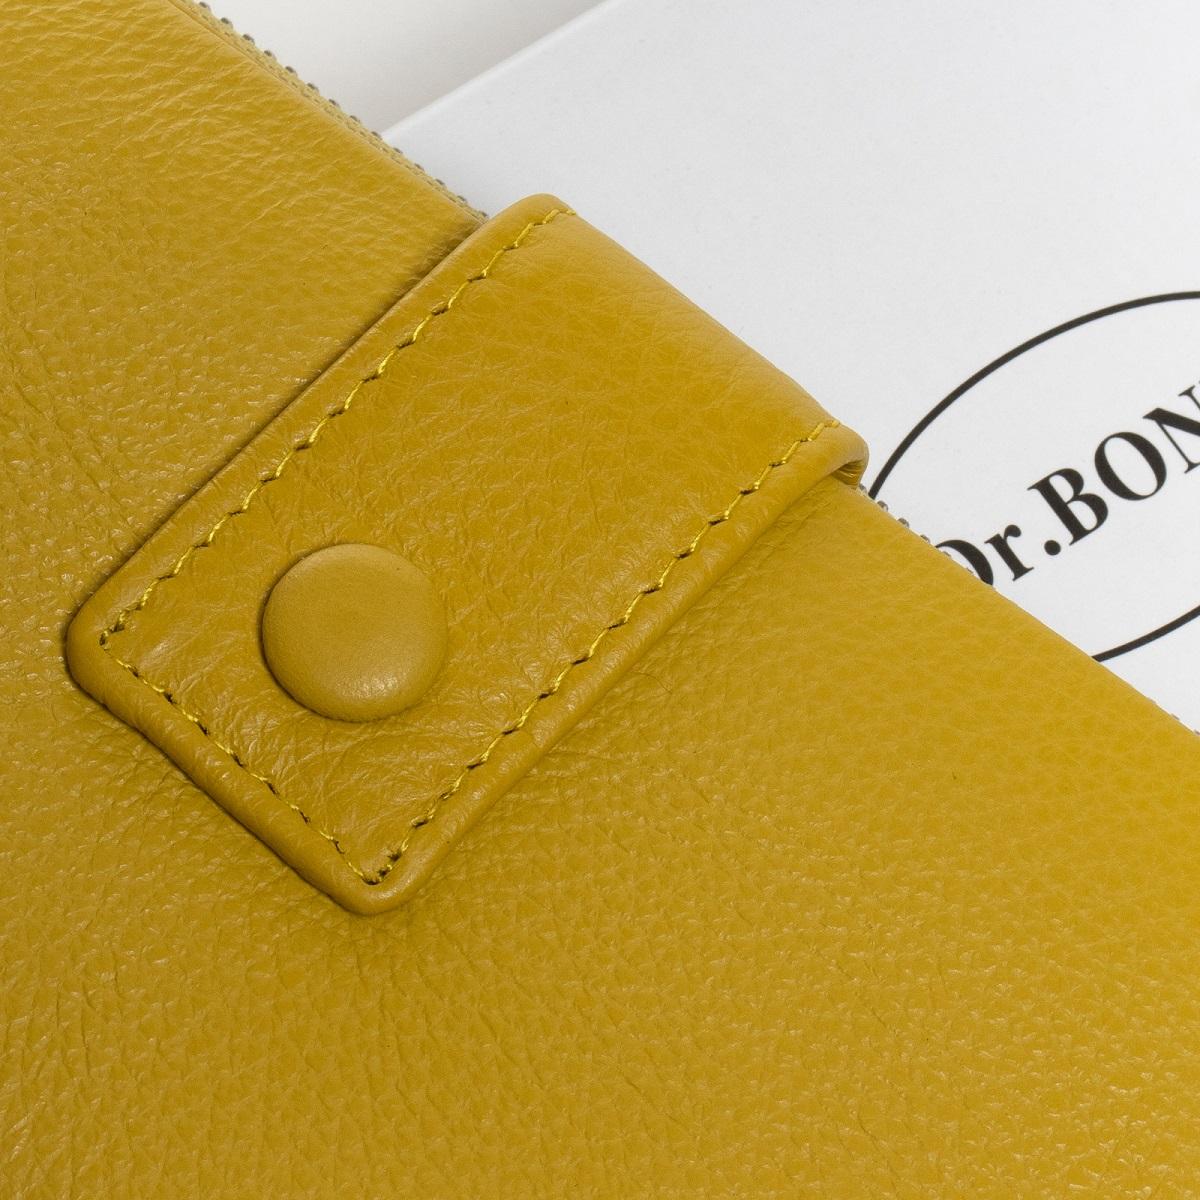 Кошелек Classic кожа DR. BOND WMB-1 yellow - фото 4